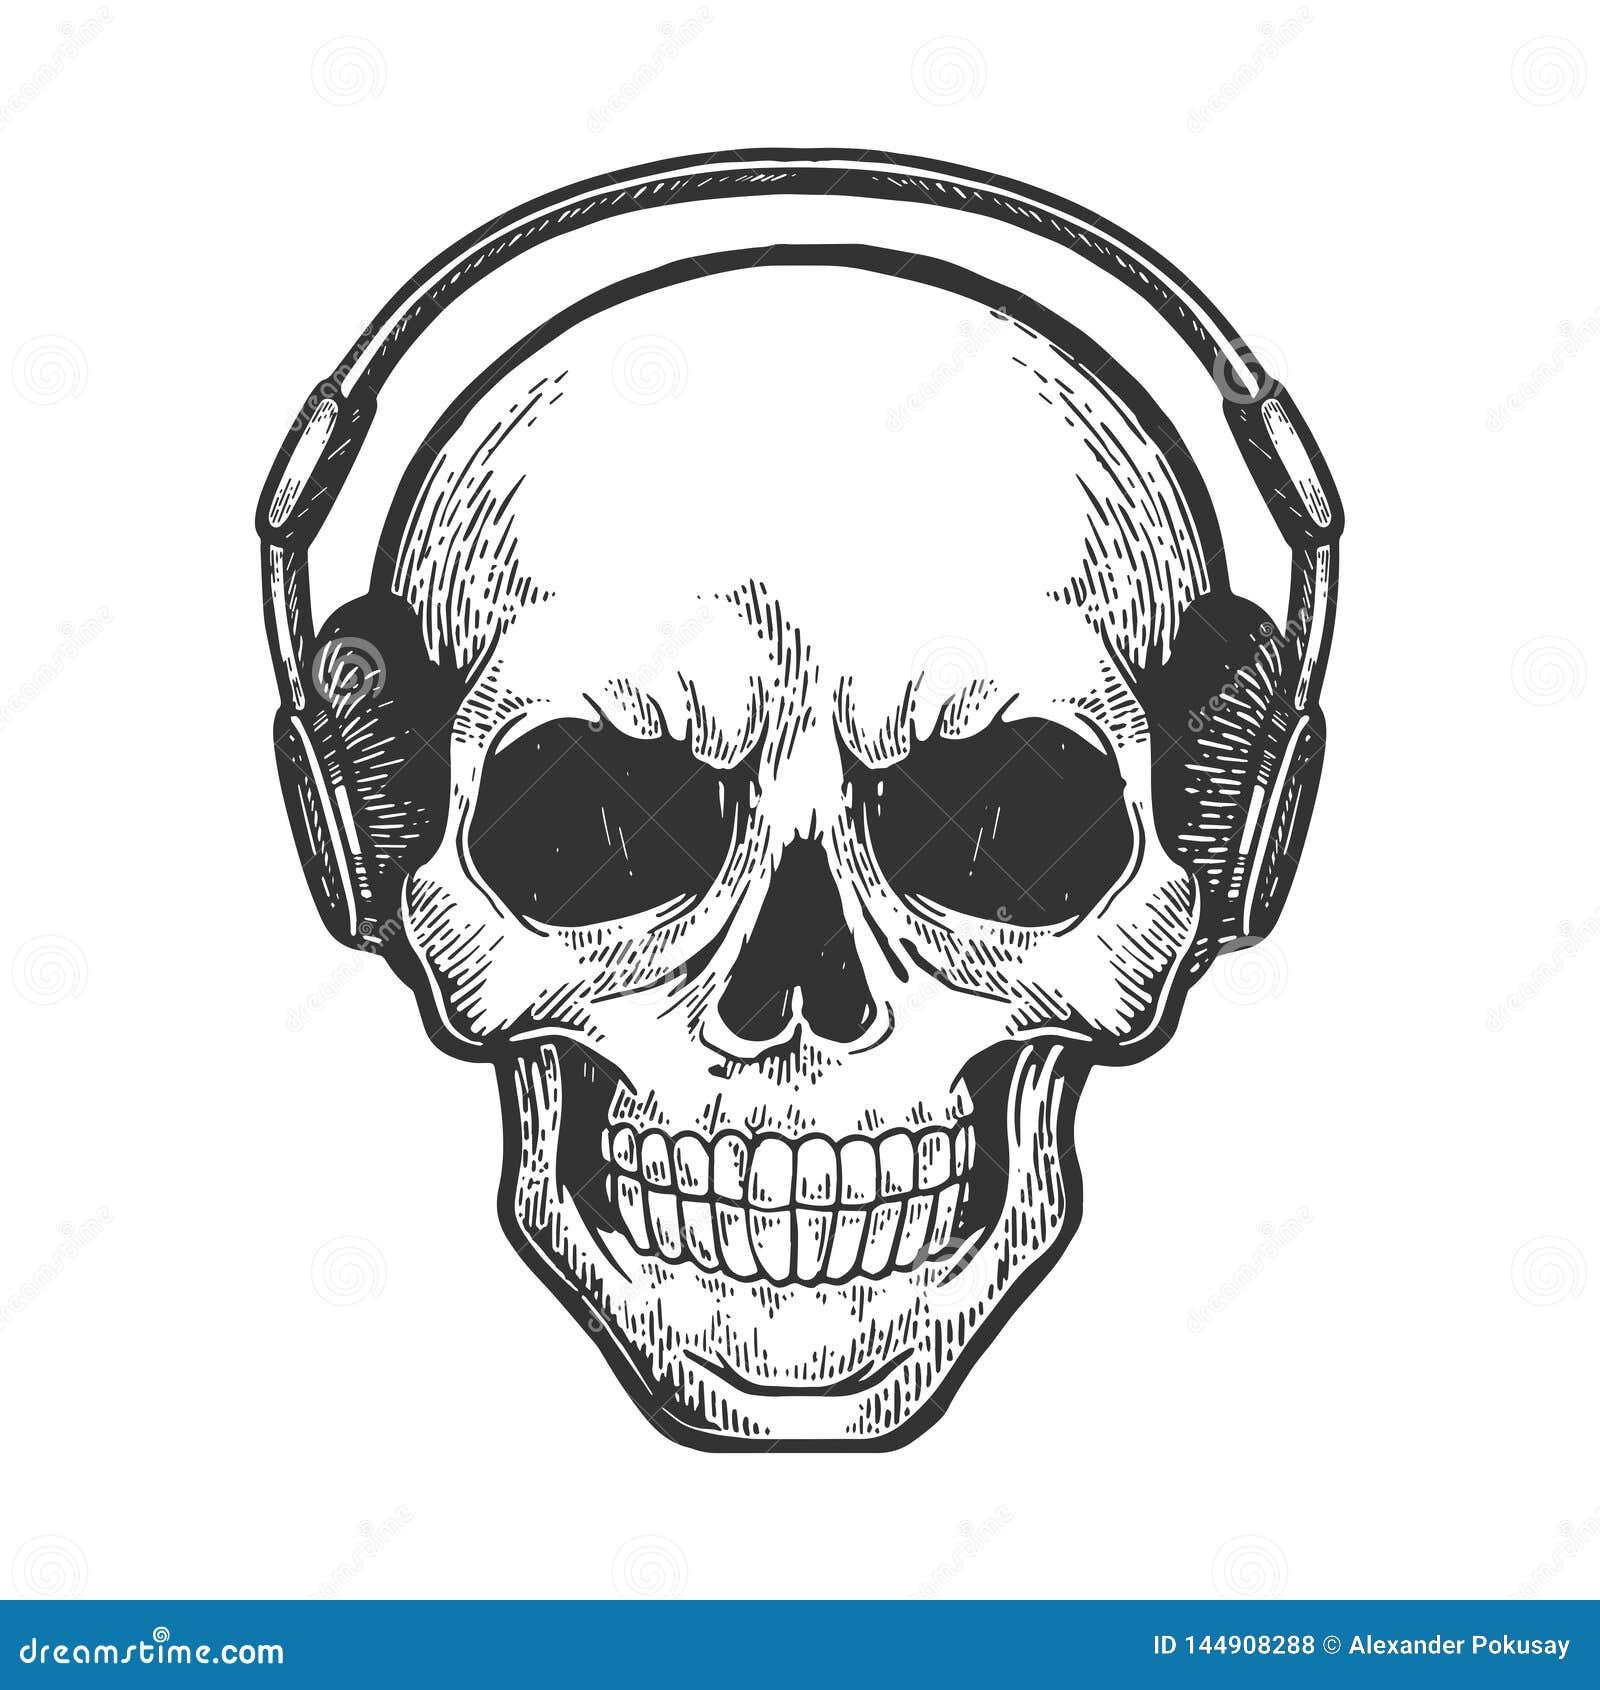 1b03204f6b8 Human Skull In Headphones Sketch Engraving Vector Stock Vector ...